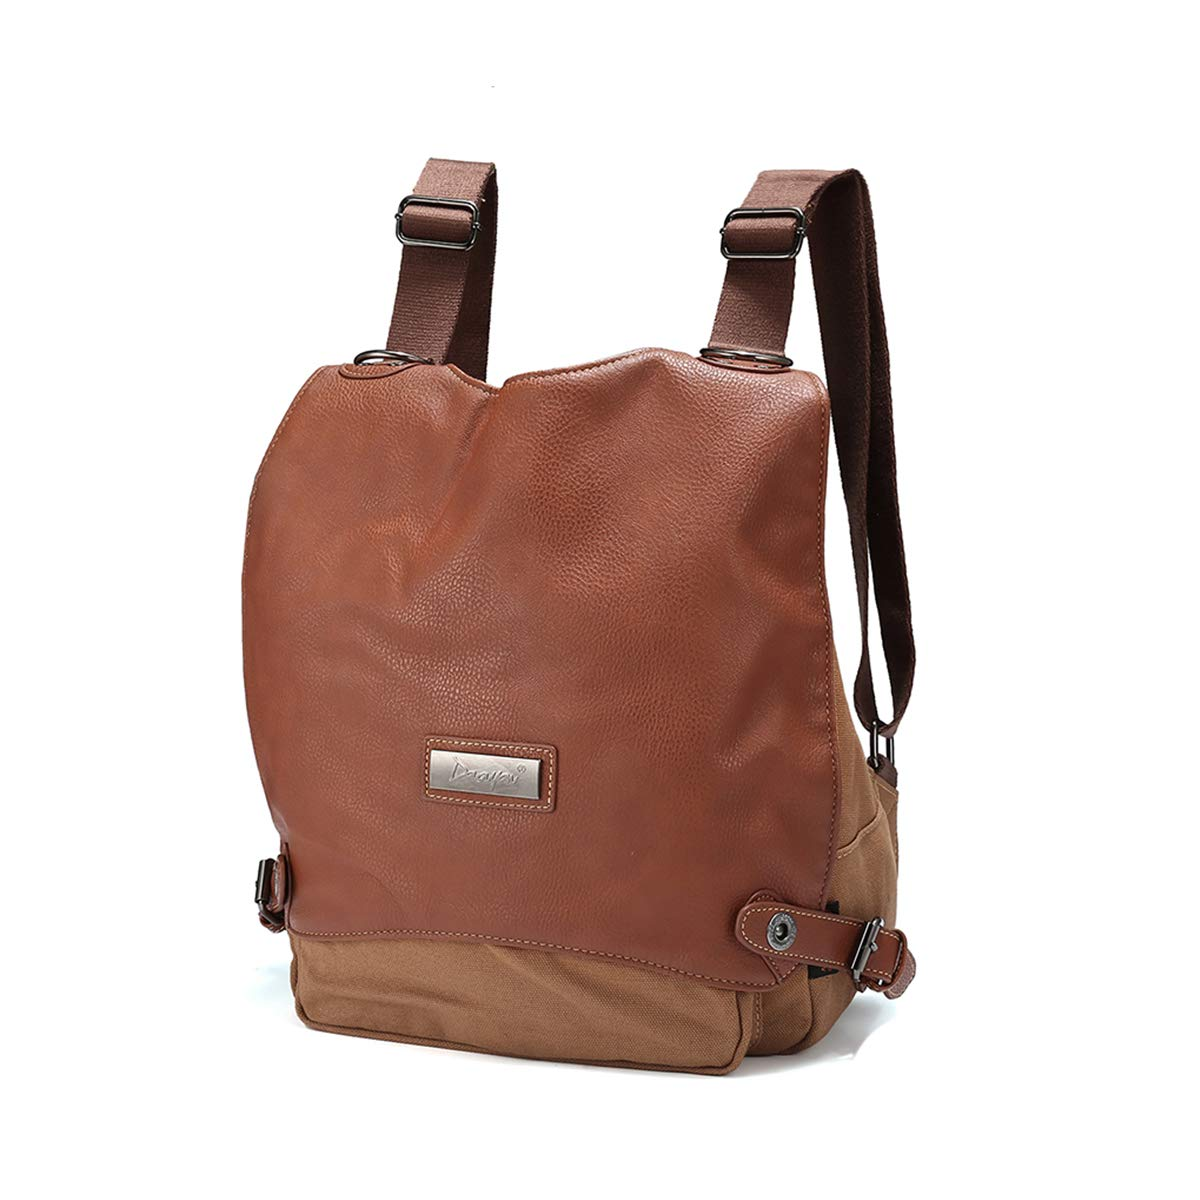 Fashion Anti-Theft Backpack, JOSEKO Women Canvas Casual Dual-Use Shoulder Messenger Bag Rucksack Shoulder Bag for Ladies Brown